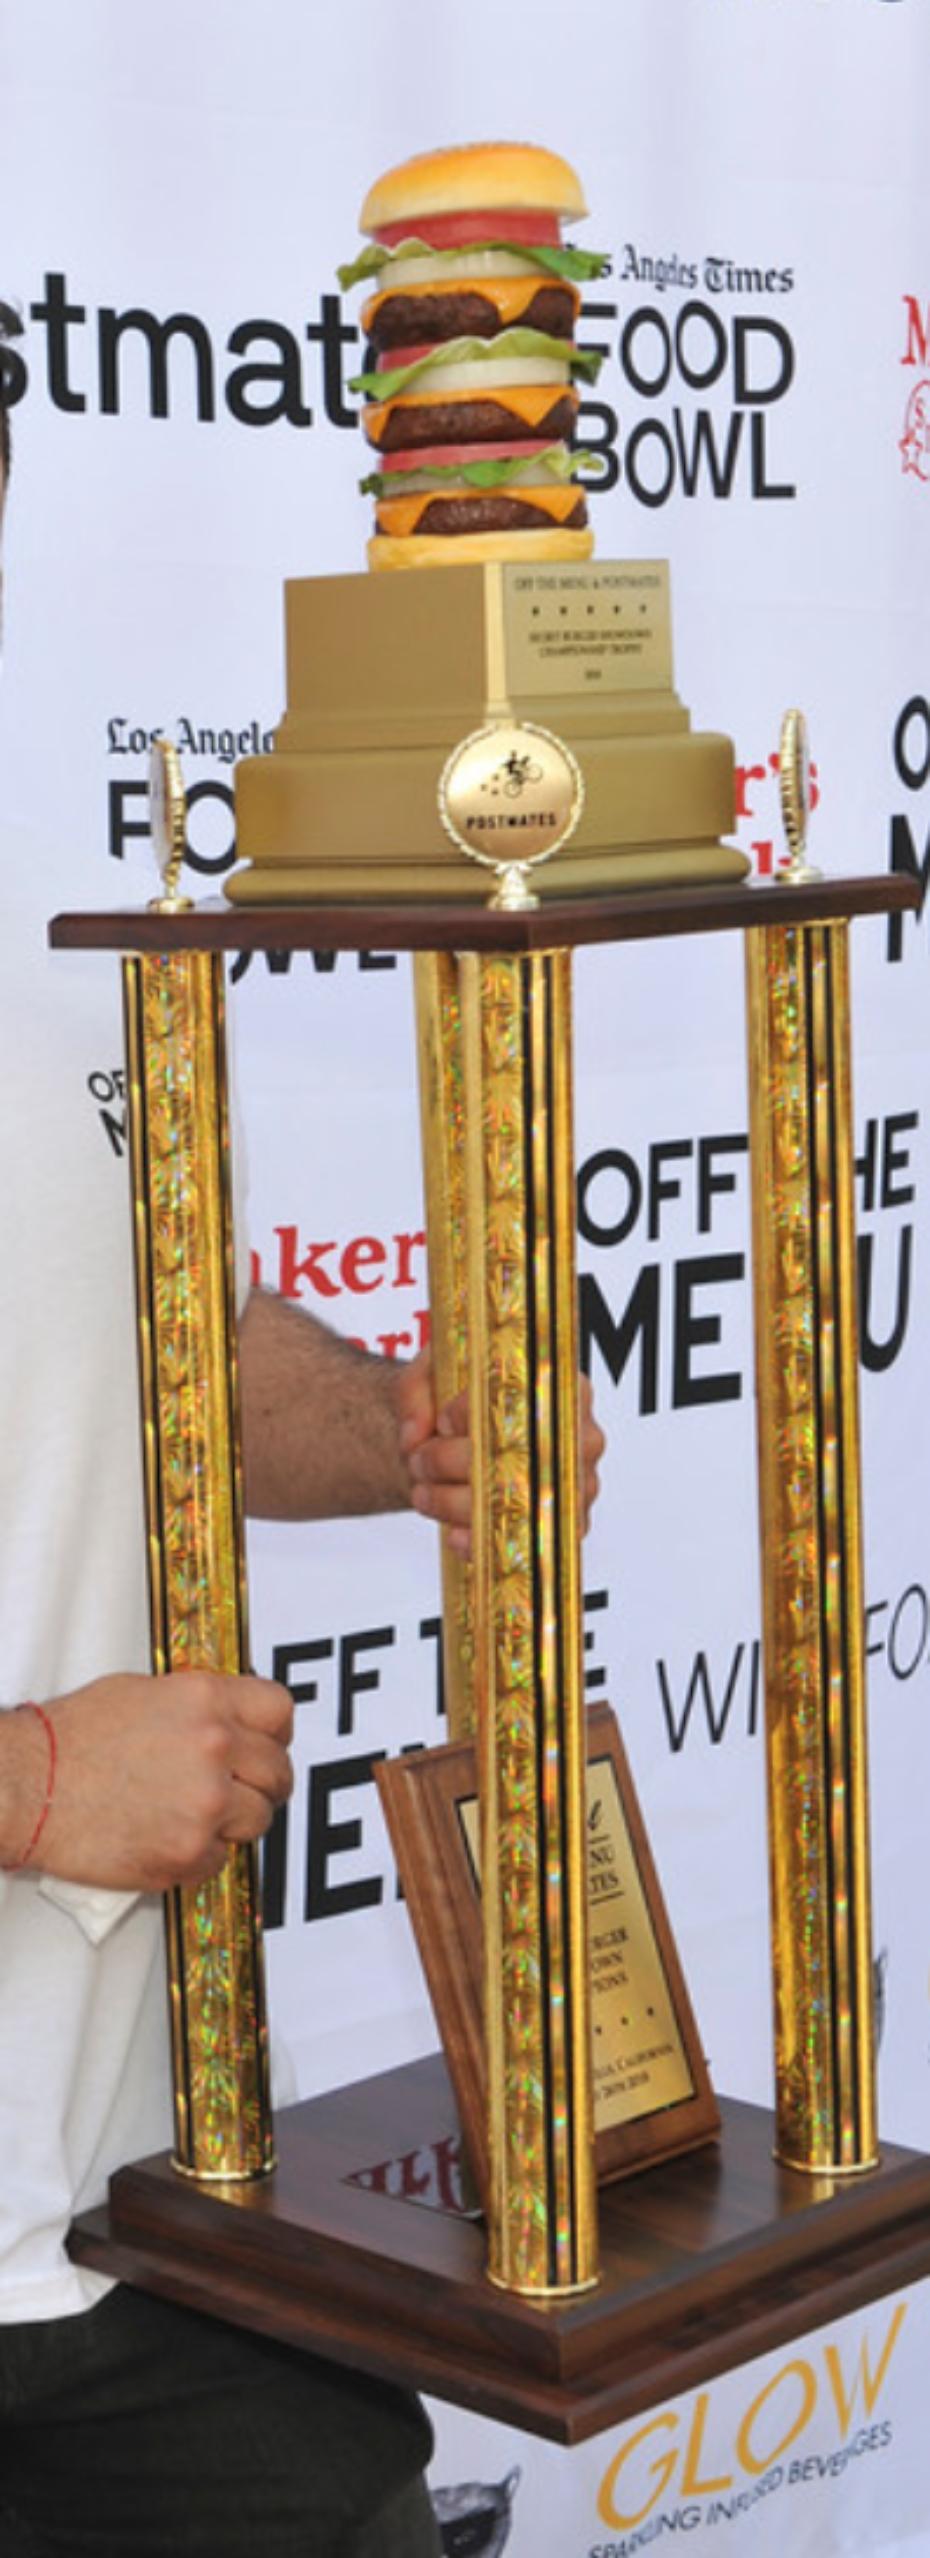 food-bowl-trophy-052918-2